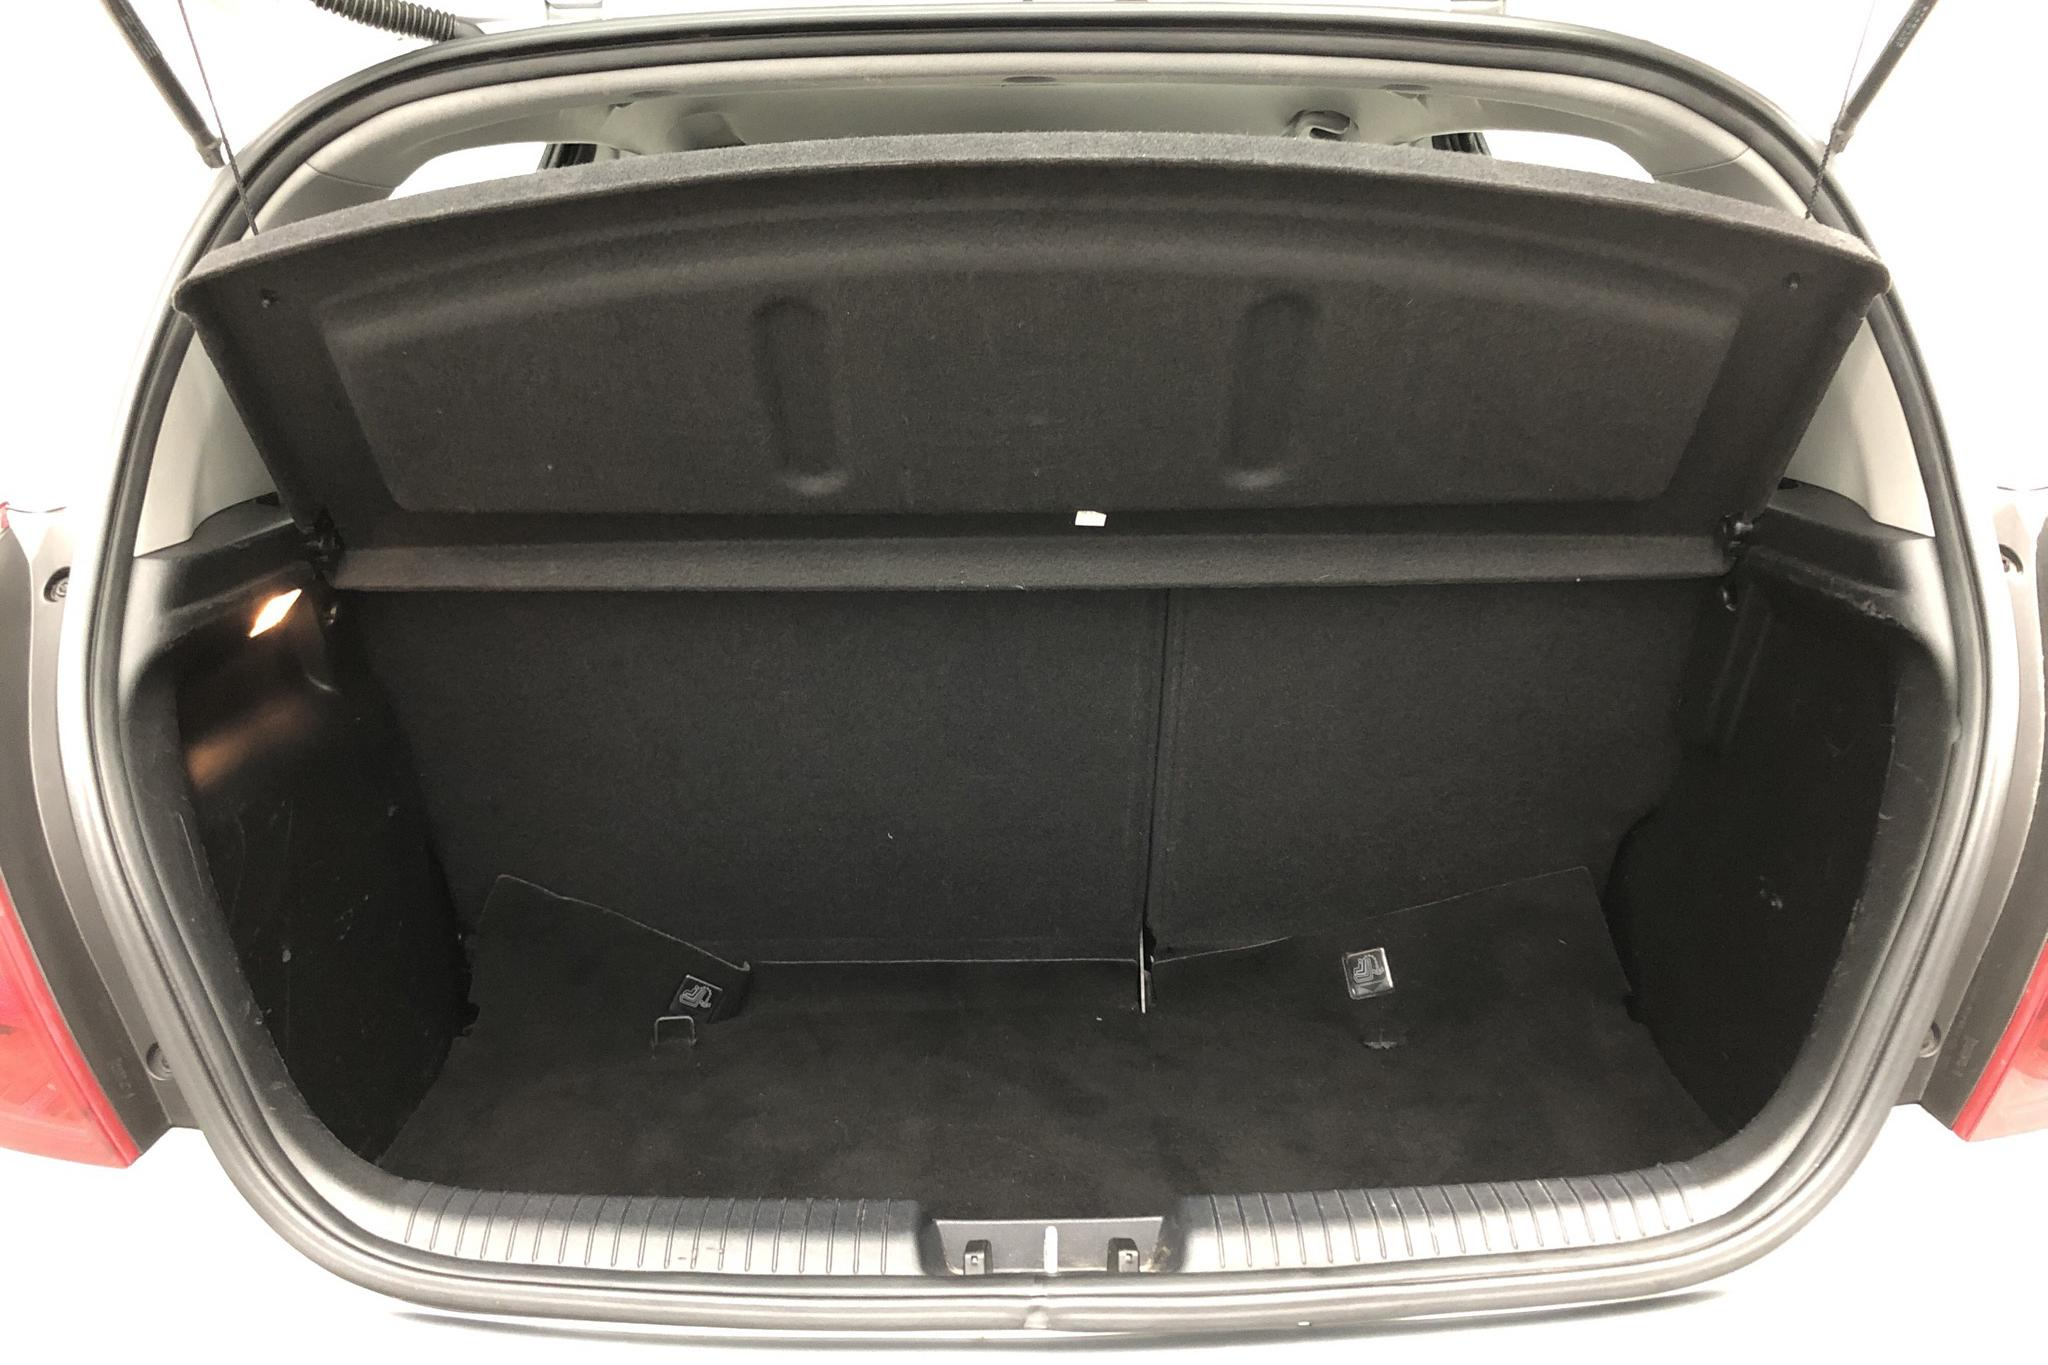 Hyundai i20 1.2 (78hk) - 5 944 mil - Manuell - silver - 2011